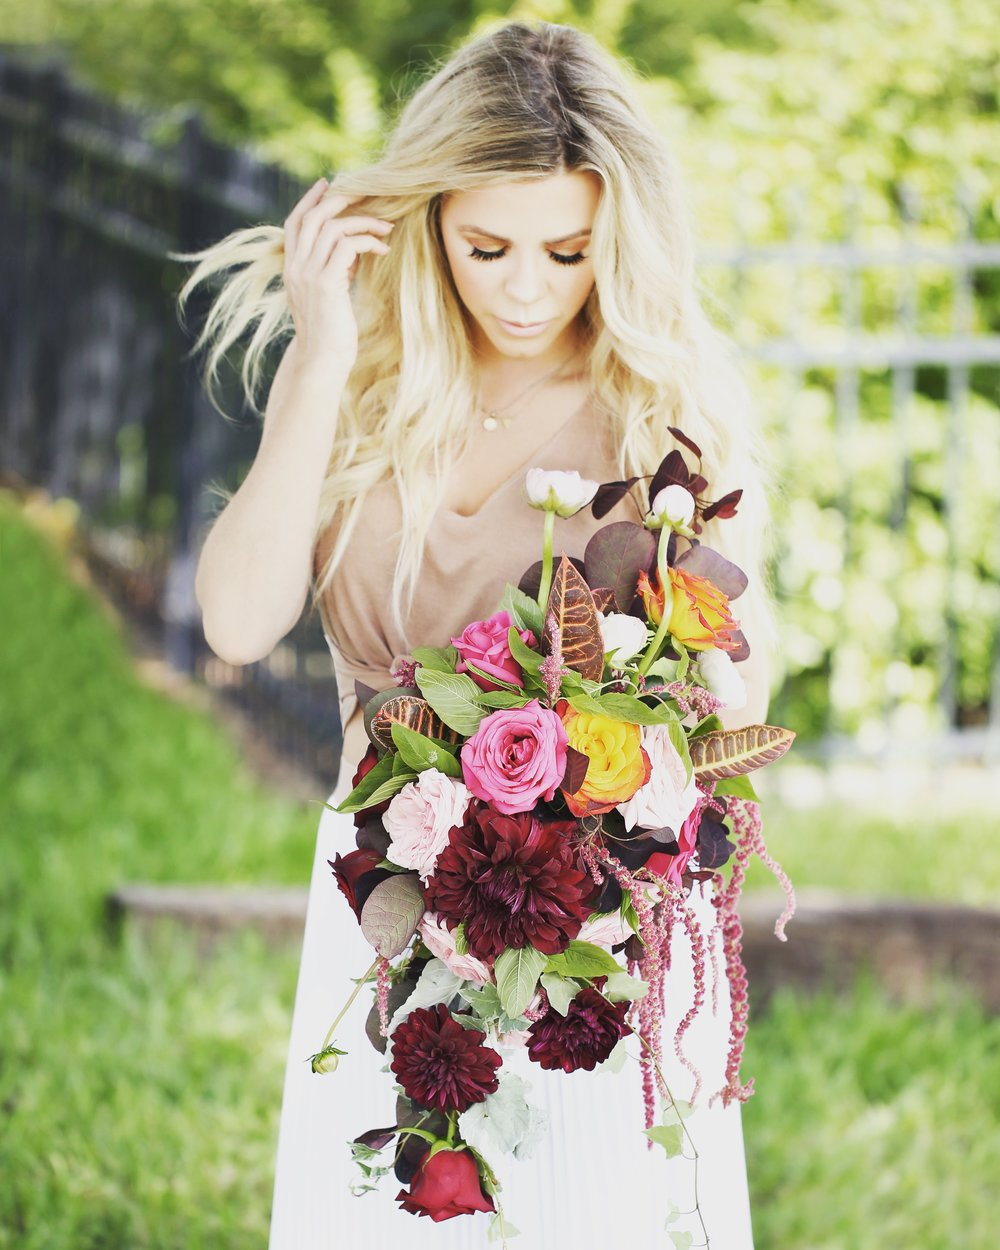 Dahlias, garden roses, spray roses, ranunculus, hanging amaranthus